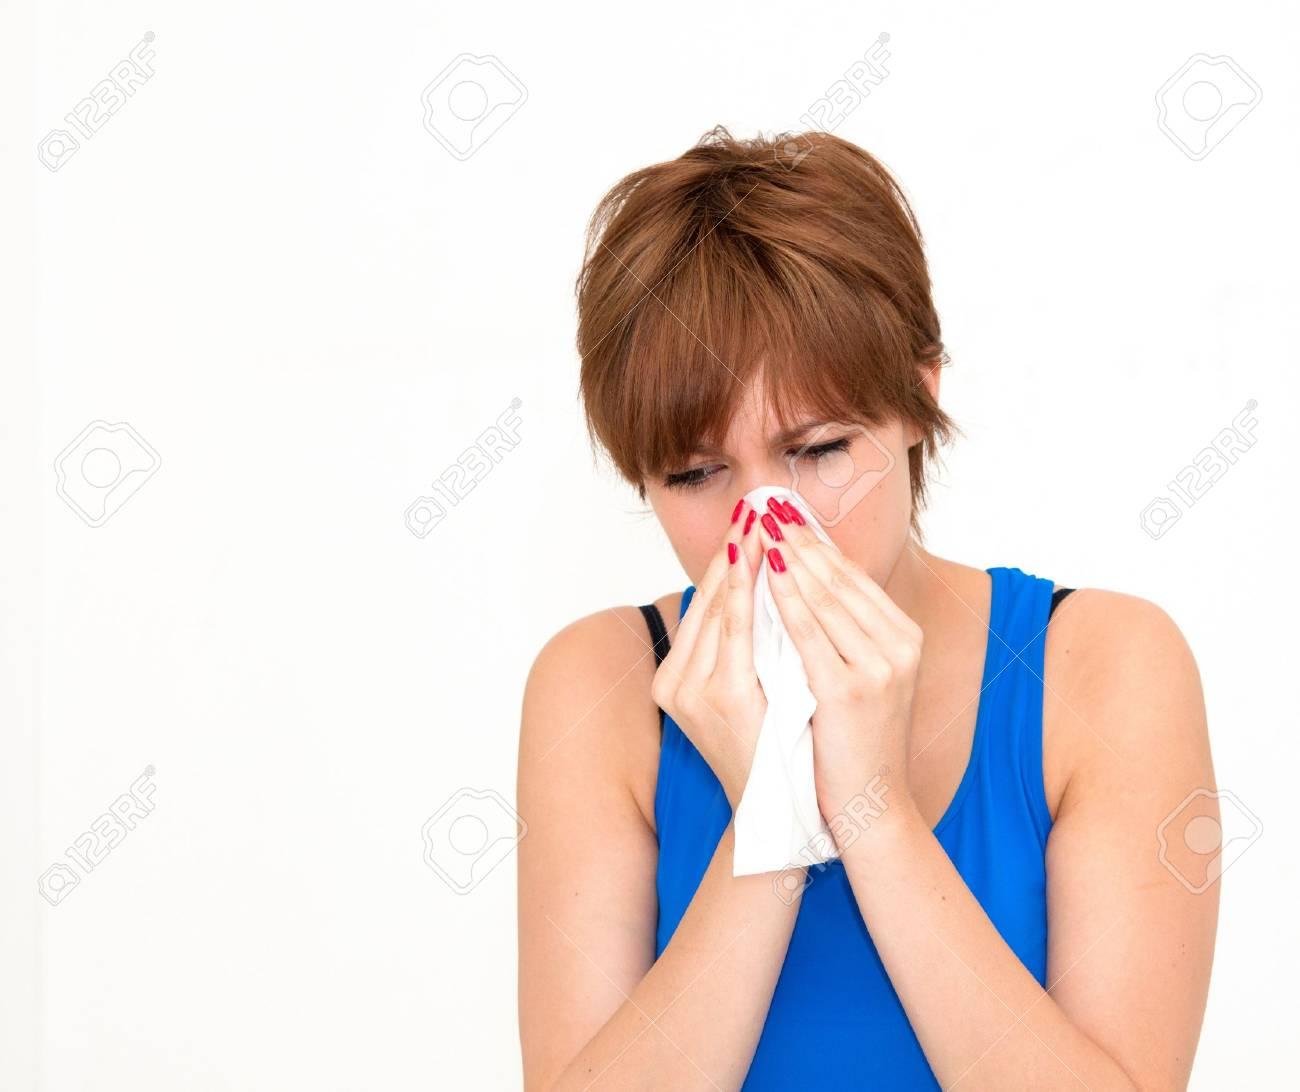 woman using tissue on white background Stock Photo - 13300397